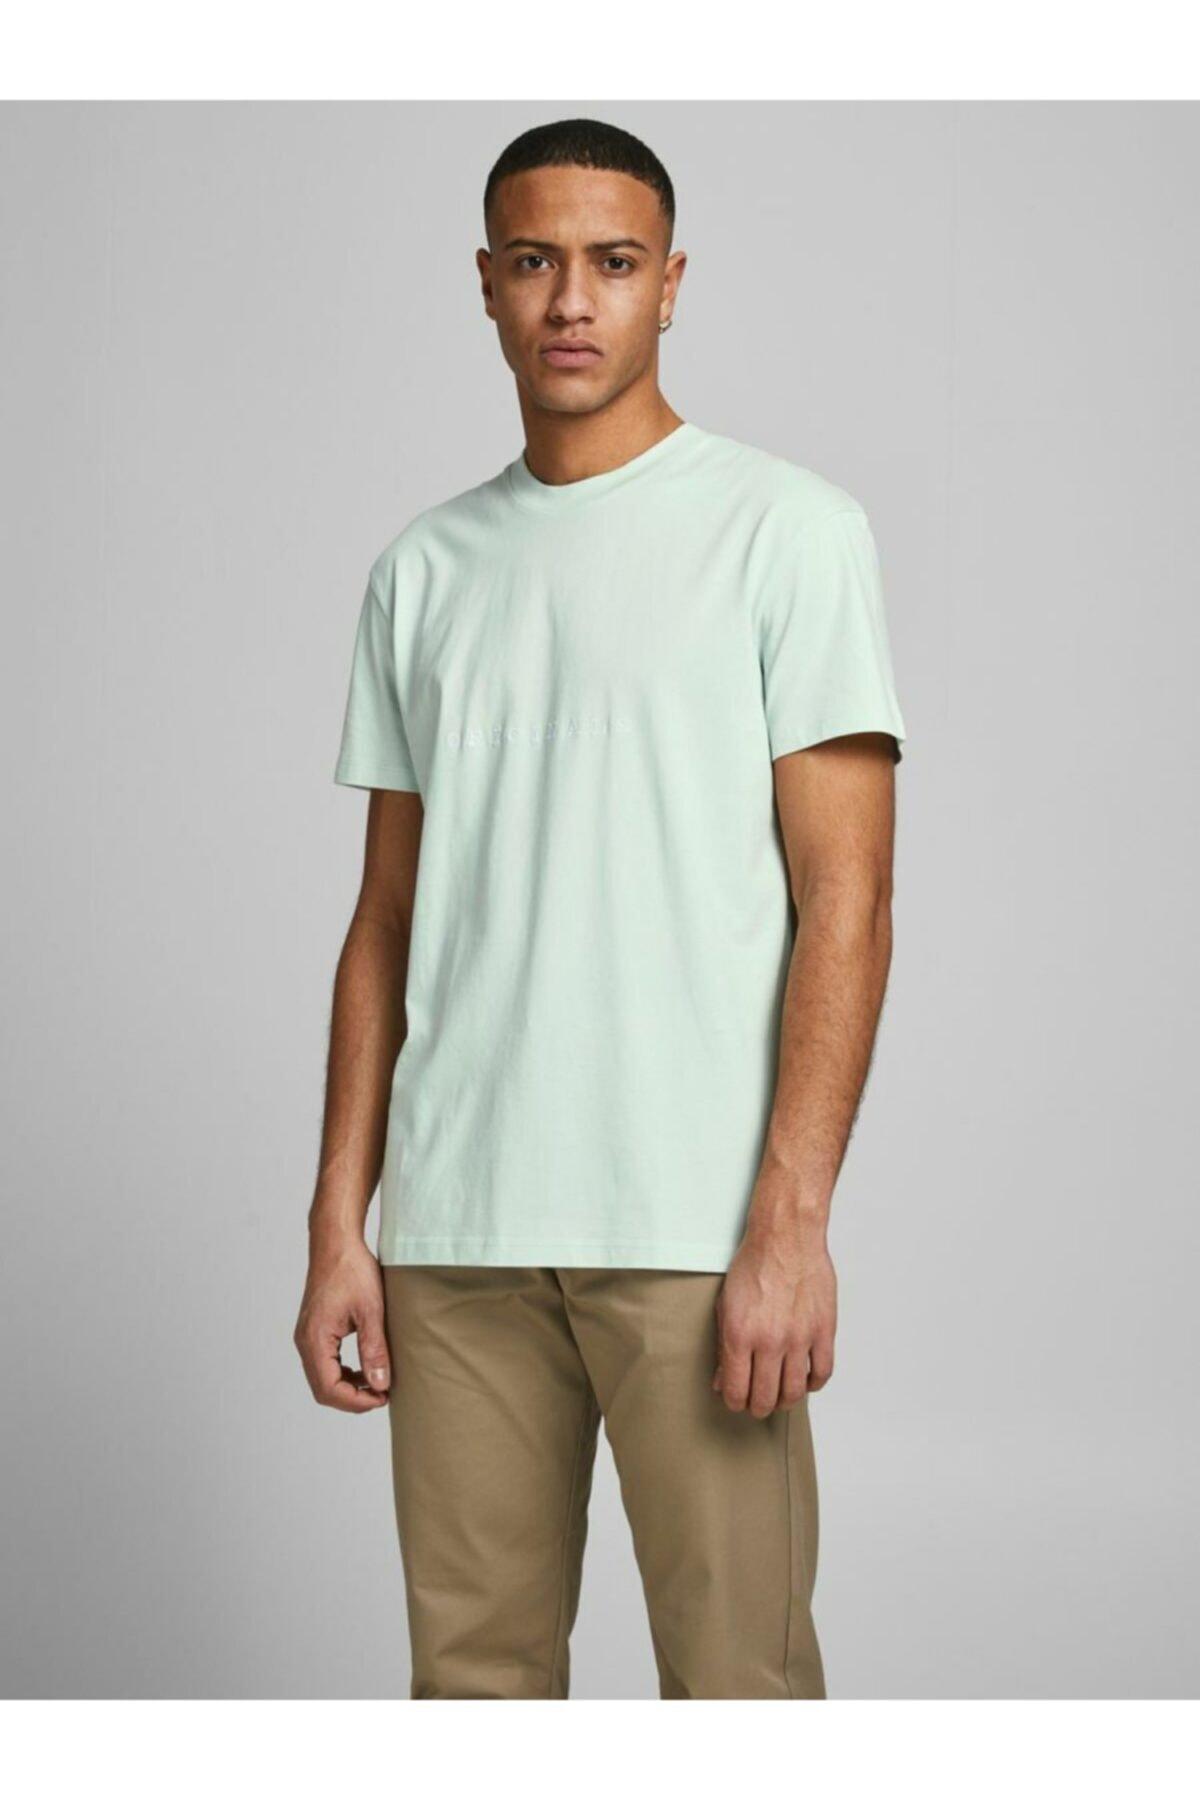 Jack & Jones Erkek Turkuaz Kısa Kollu T-Shirt 12176780 1